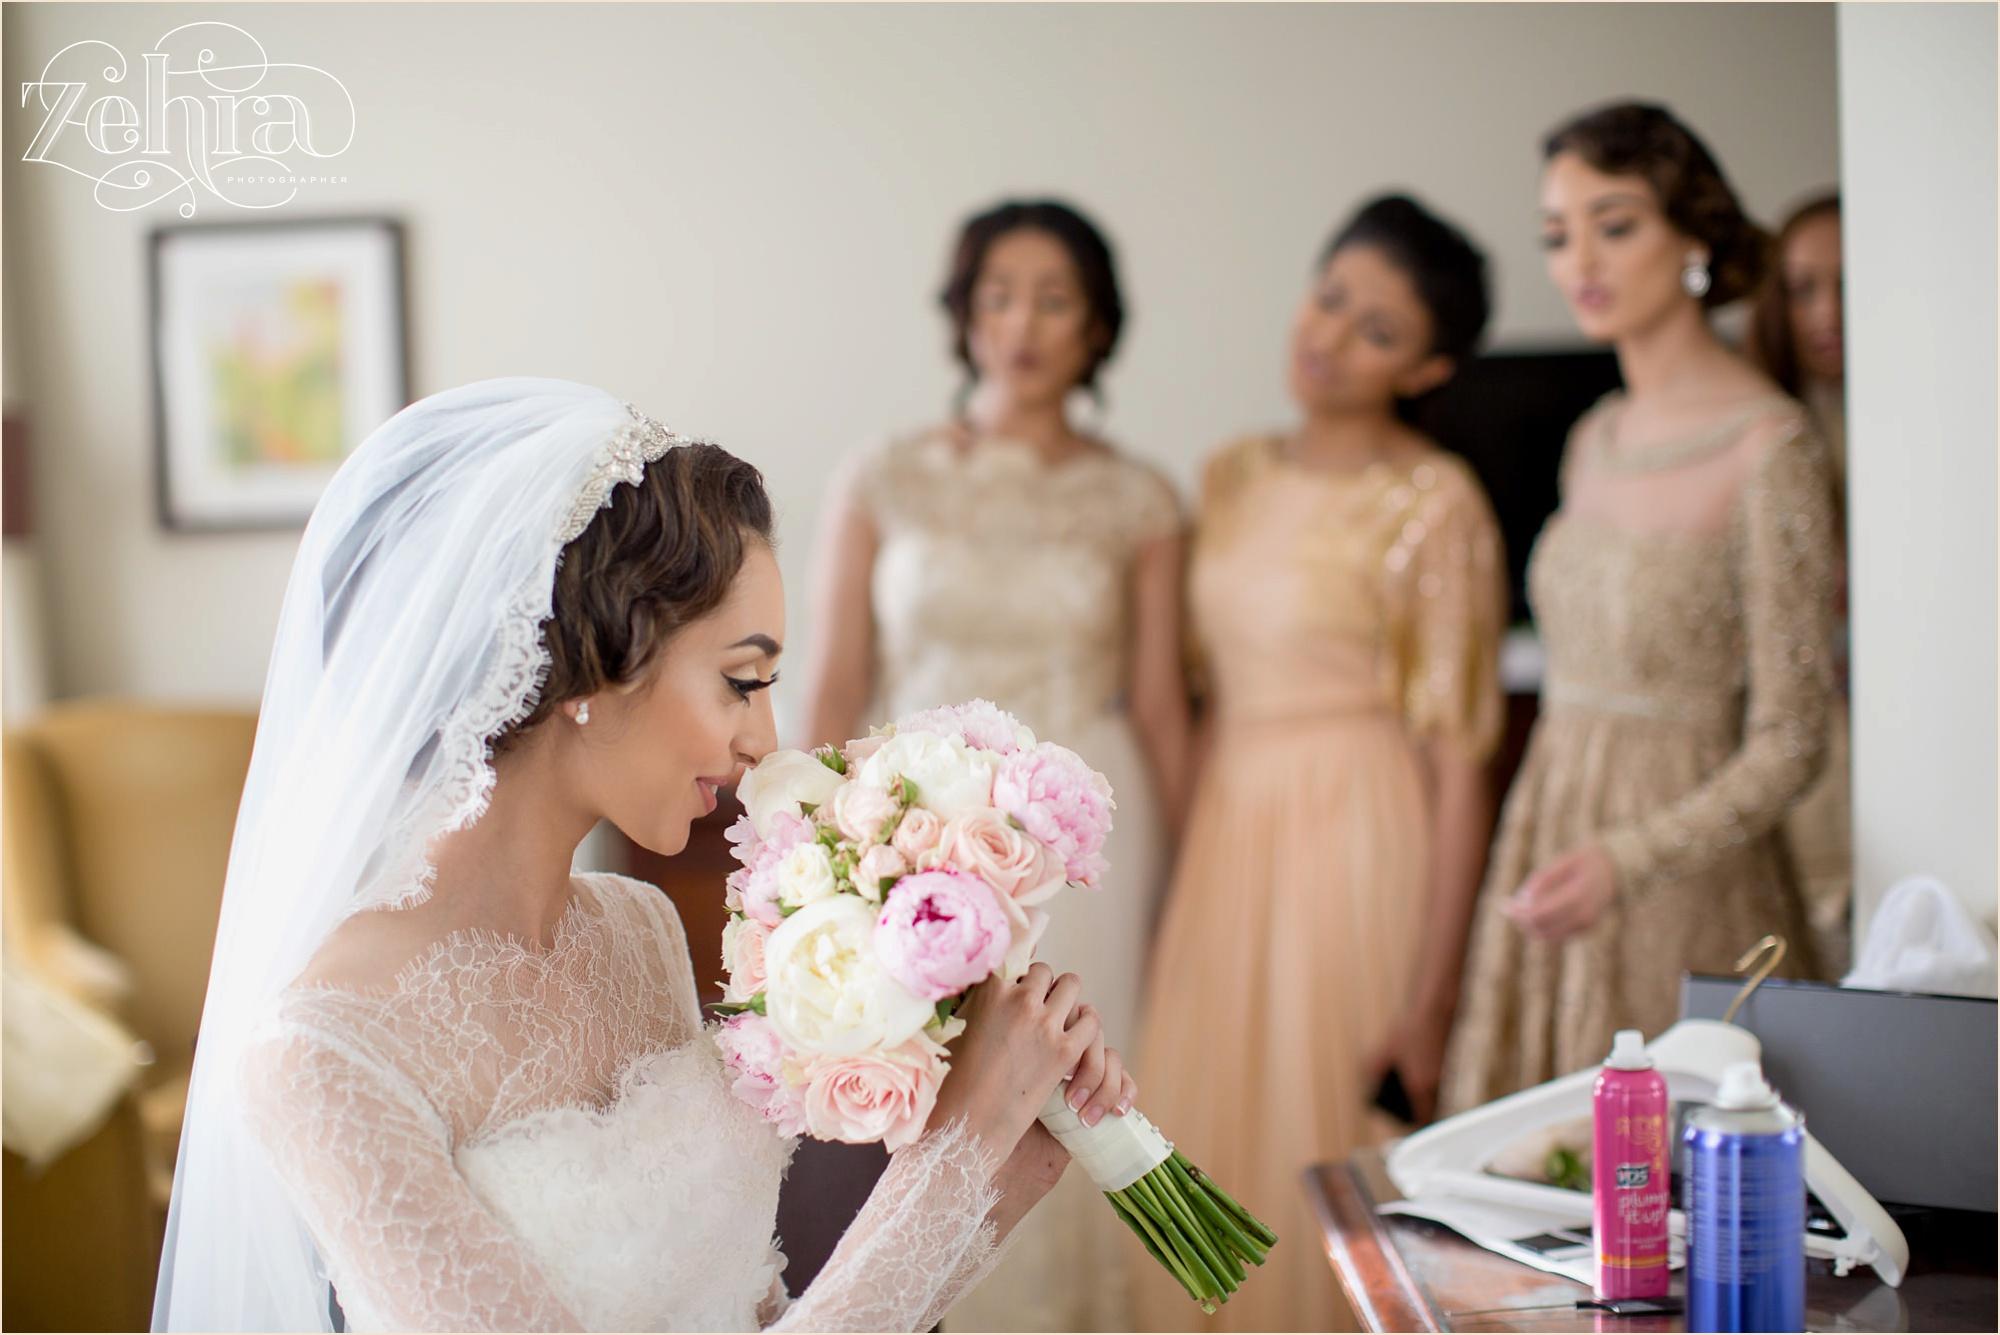 jasira manchester wedding photographer_0015.jpg